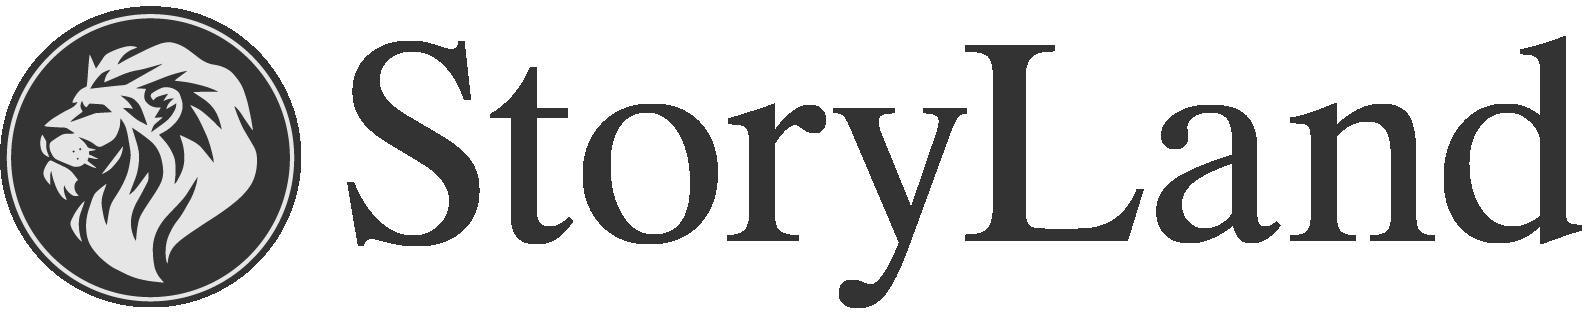 Uitgeverij Storyland